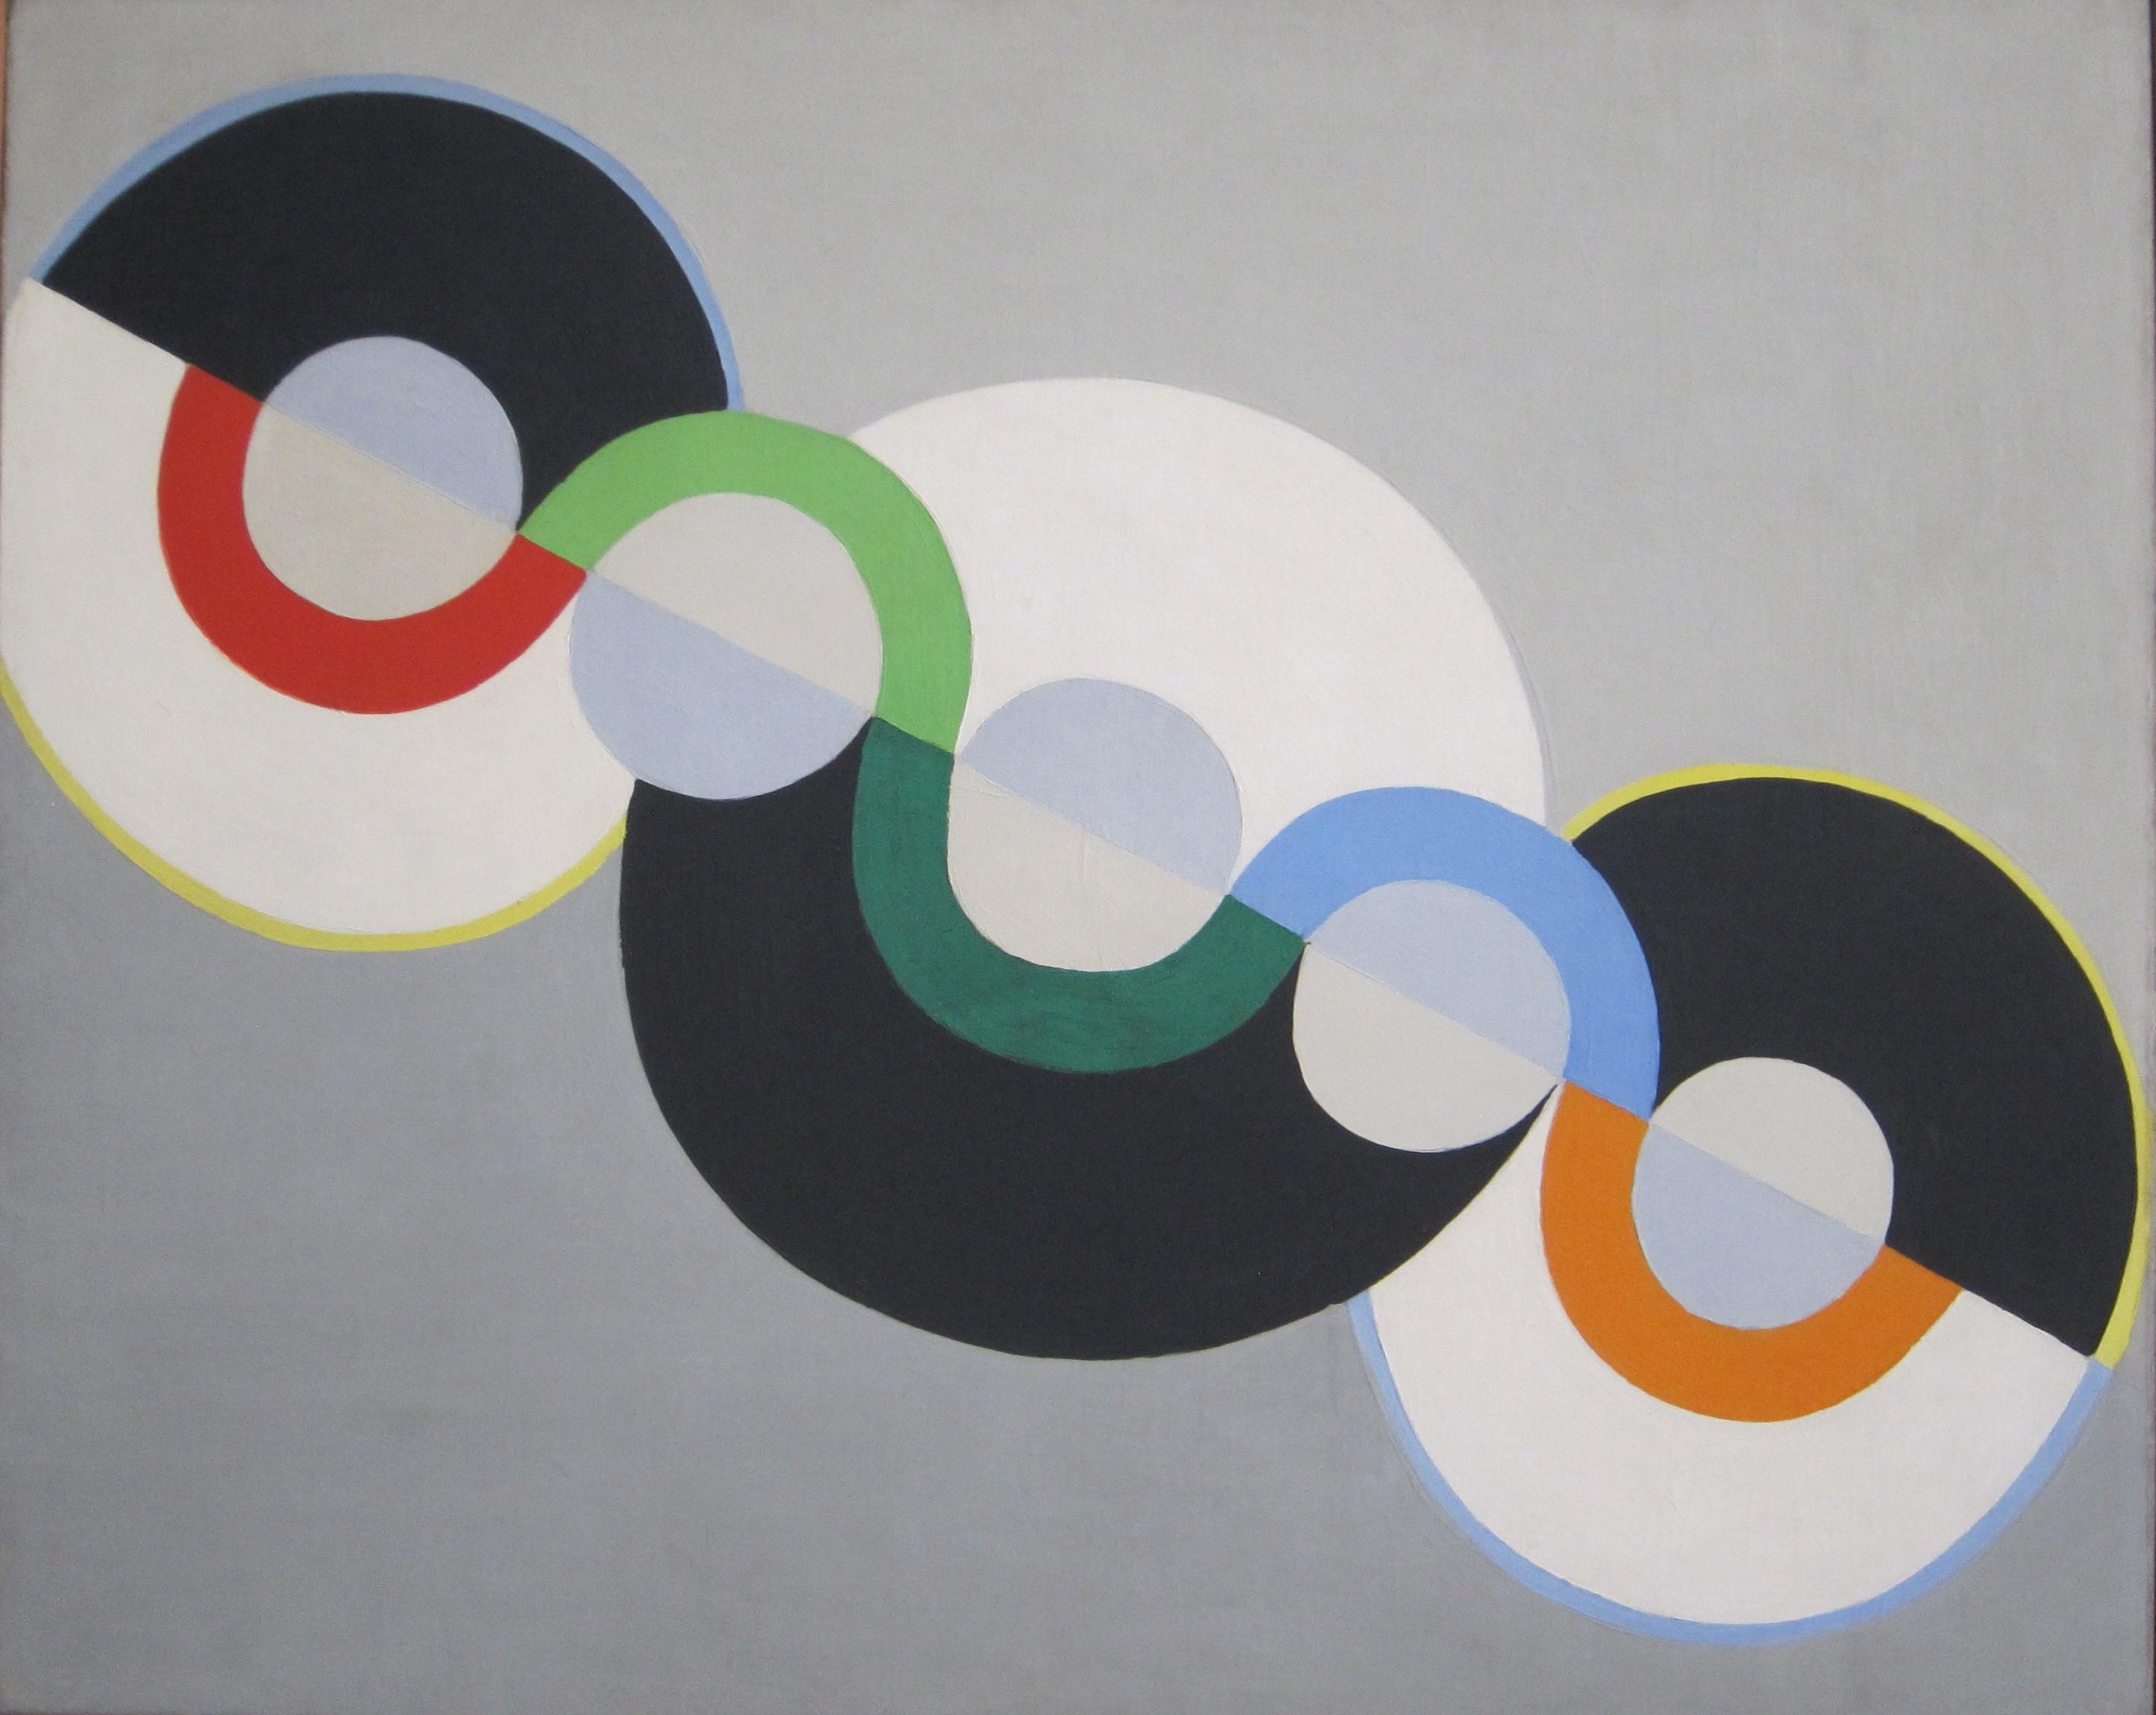 'Endless Rhythm', tekijä Robert Delaunay (Tate Modern)